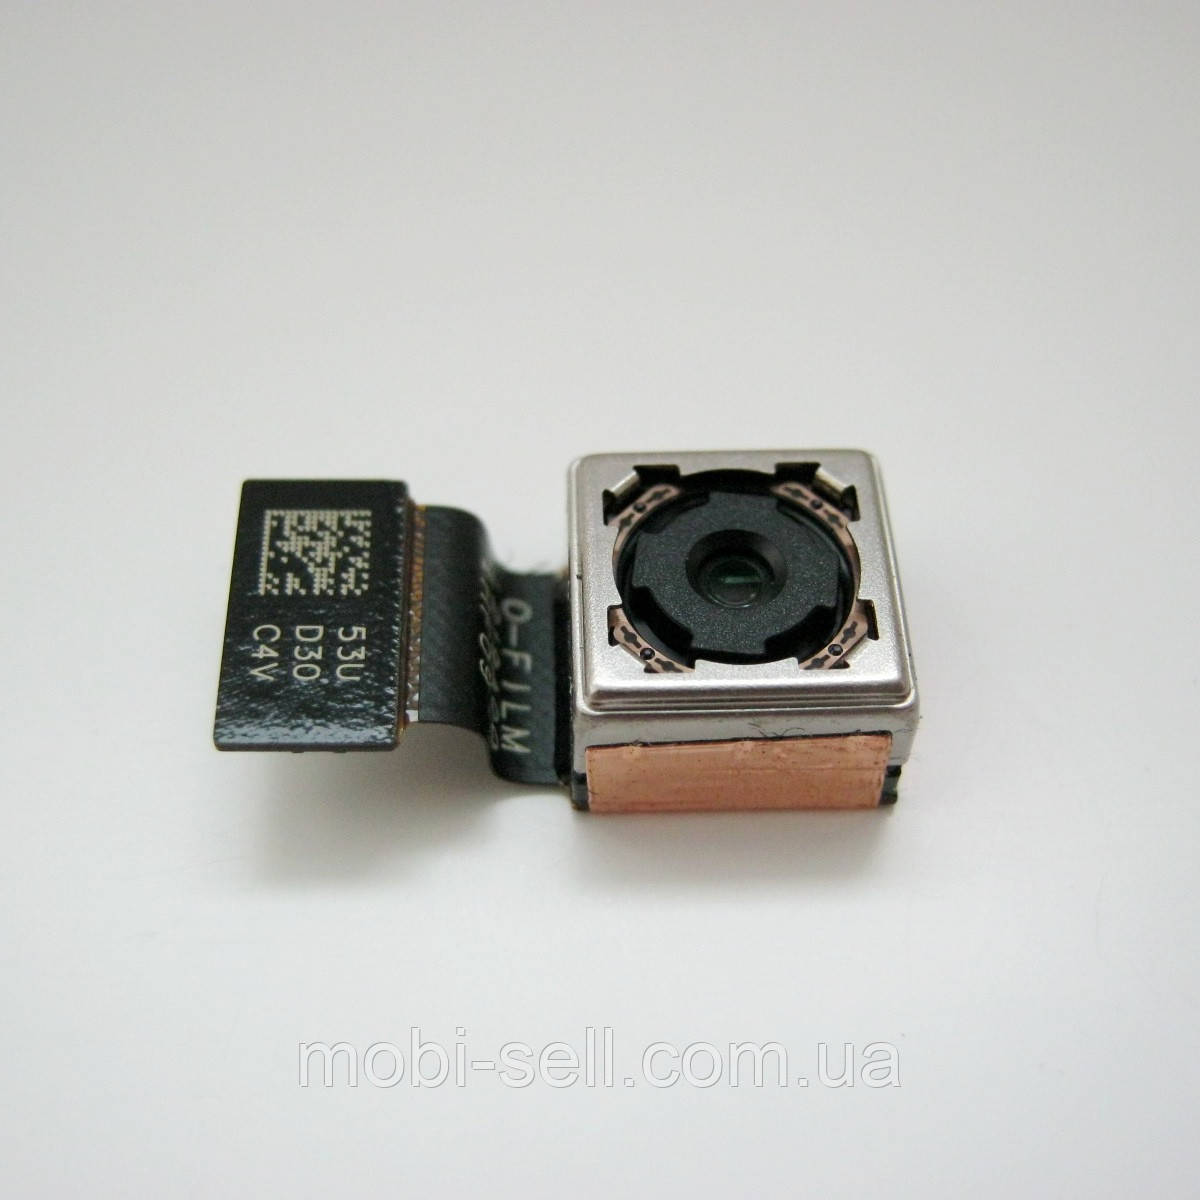 Lenovo A5000 камера основная 8 Мп p.n.: O-FILM L219A00 1HF 09 (запчасти, Б/У, разборка)